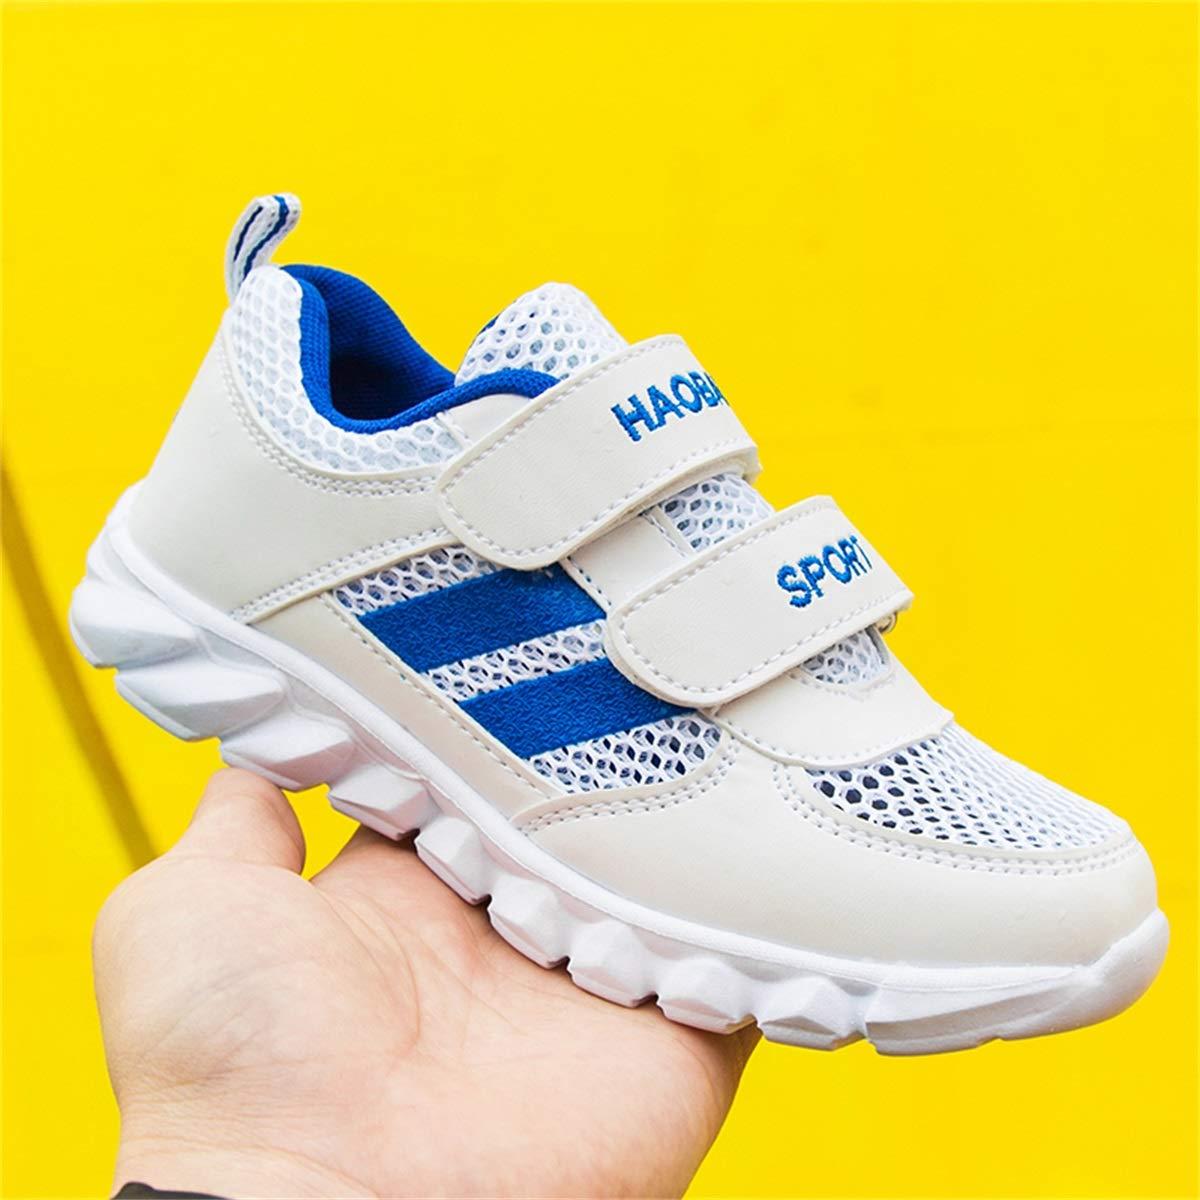 Velukin Zapatillas Deportivas Unisex para Ni/ños Transpirables Zapatillas de Running